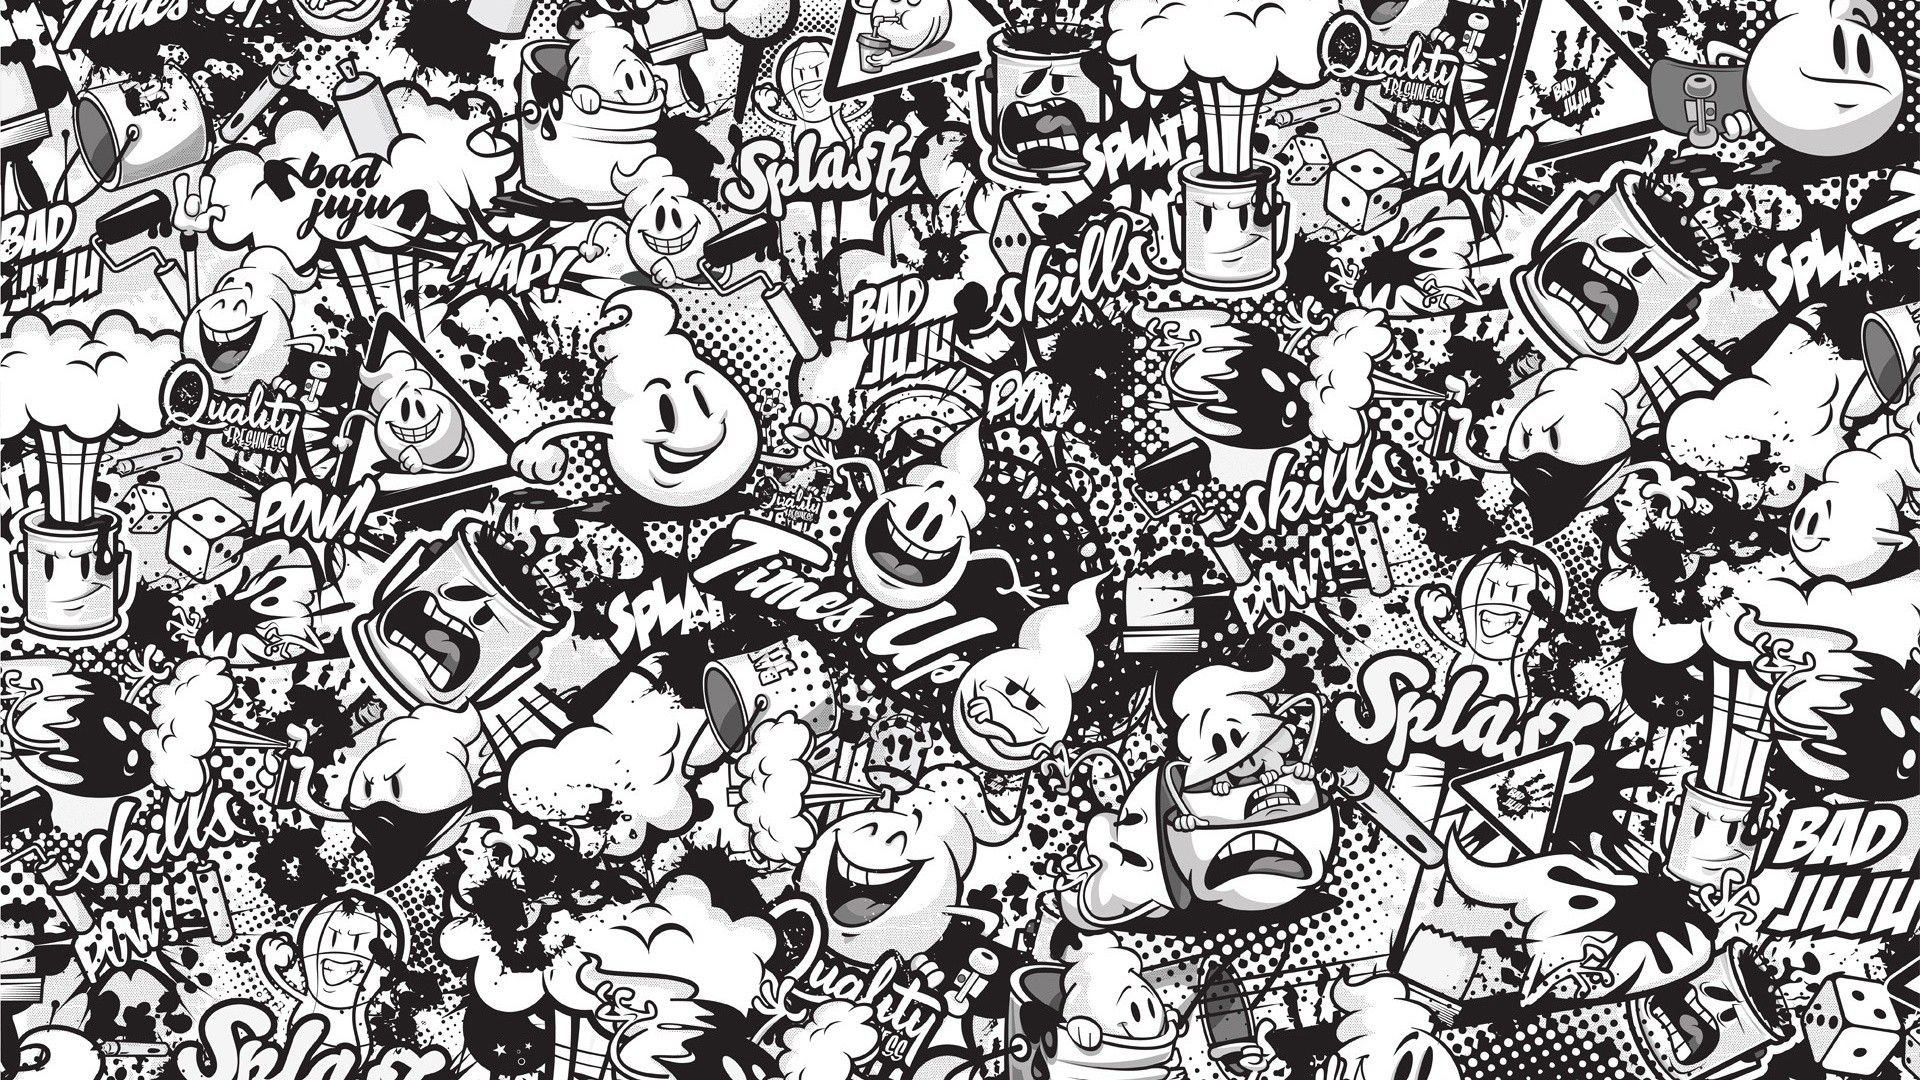 Graffiti Wall Desktop Backgrounds Hd Best Hd Wallpapers